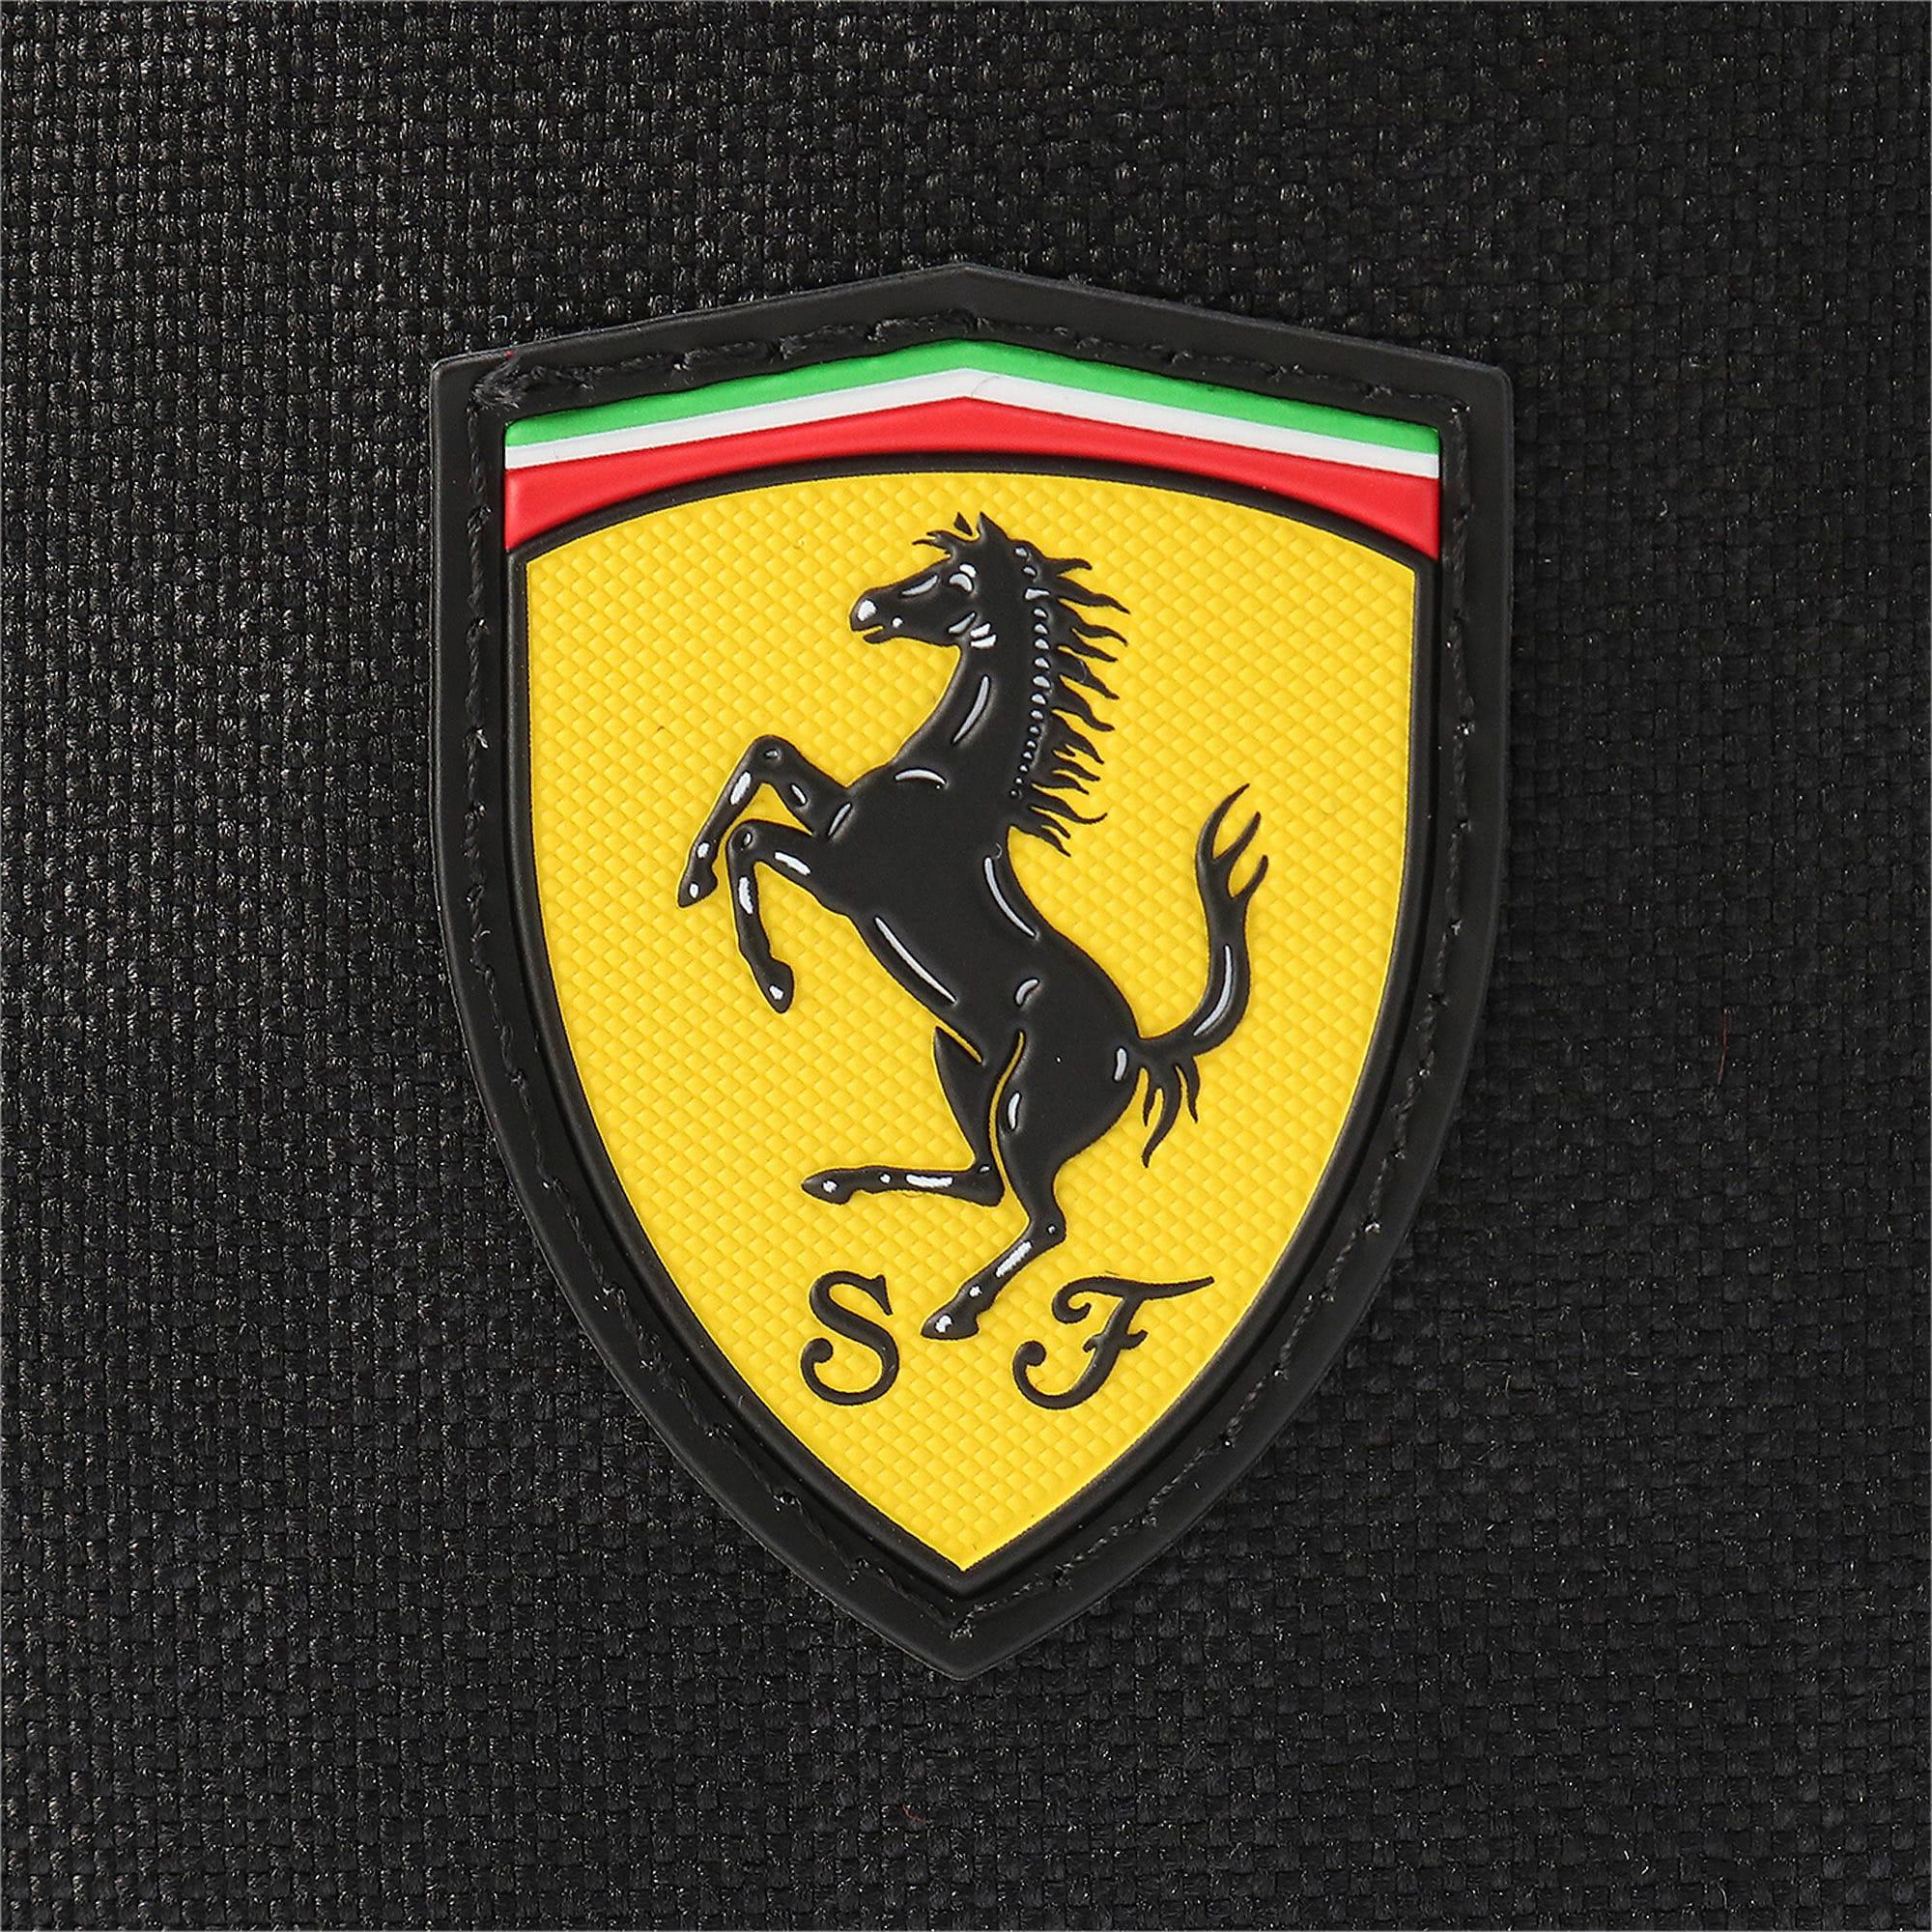 Thumbnail 9 of フェラーリ ファンウェア シリング バッグ 7L, Puma Black-Rosso Corsa, medium-JPN